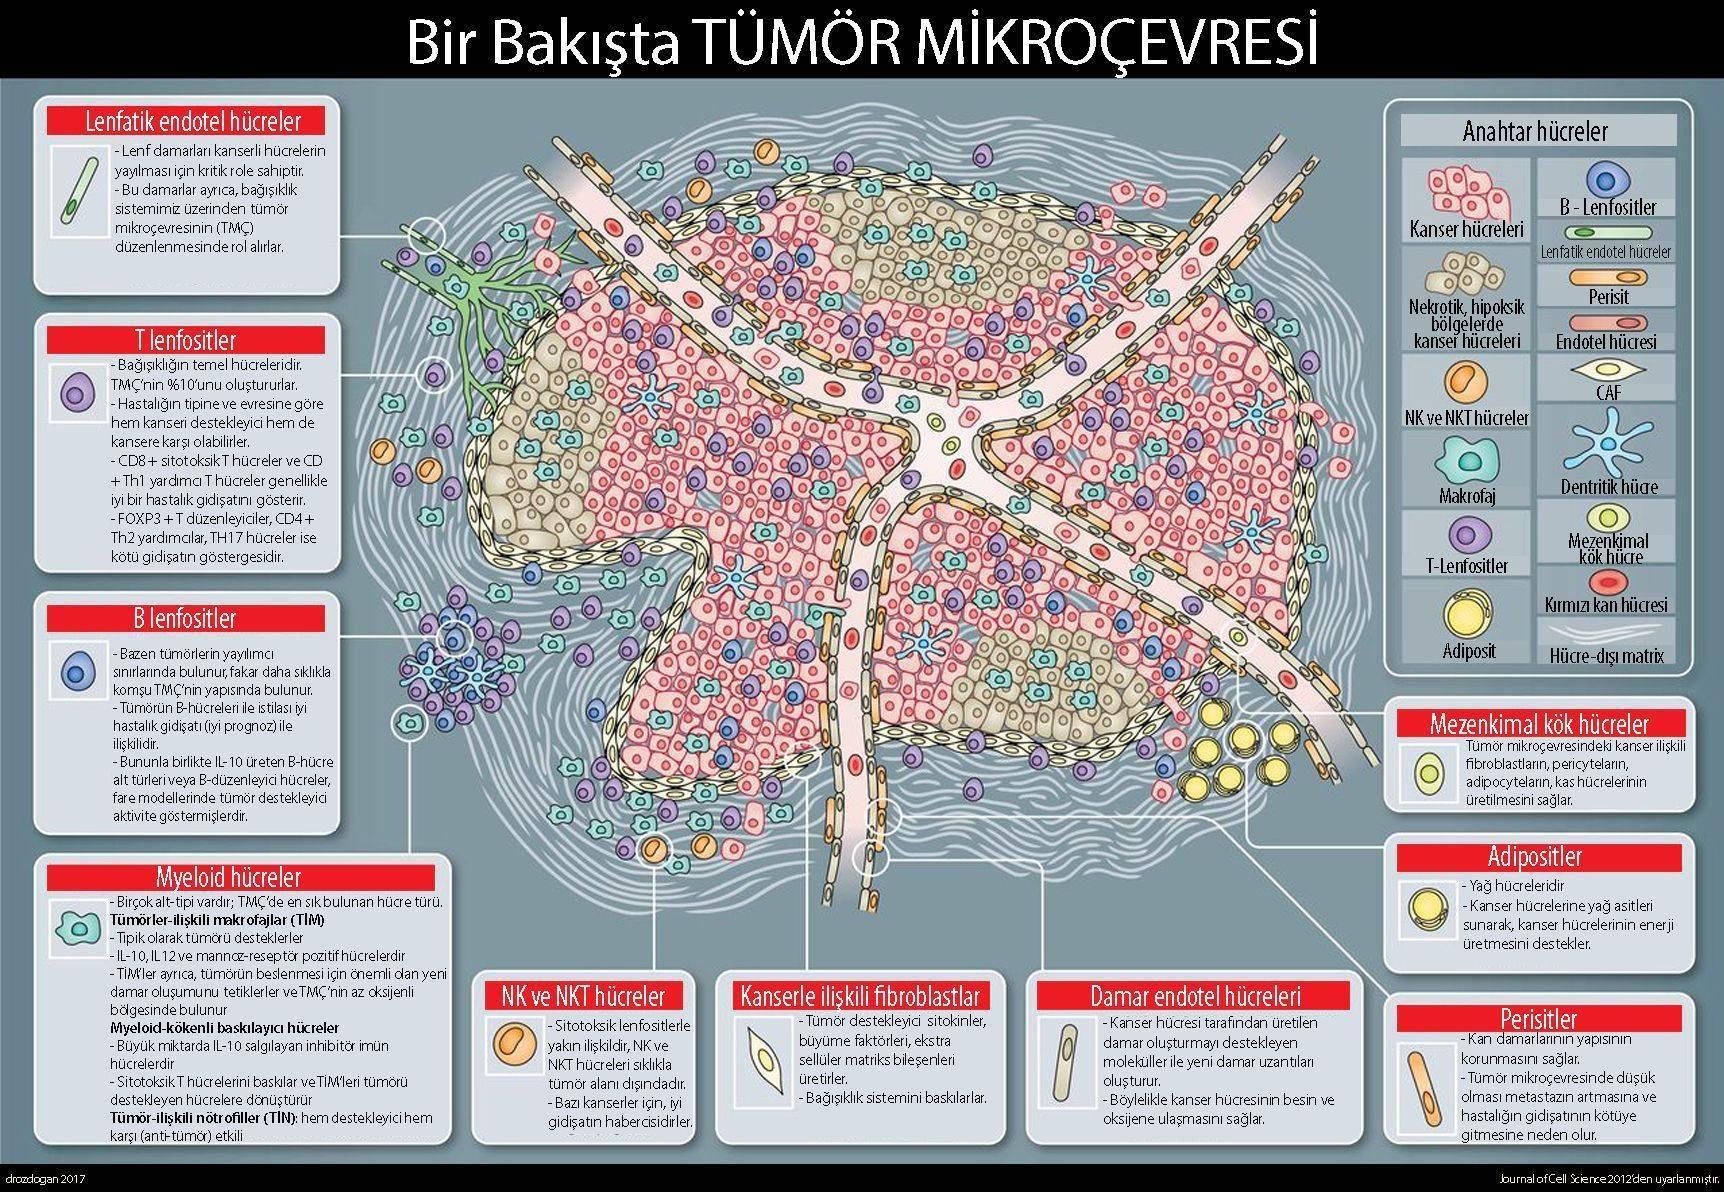 tumor kanser mikrocevresi endotel t ve b lenfositler makrofajlar natural killer fibroblastlar peris